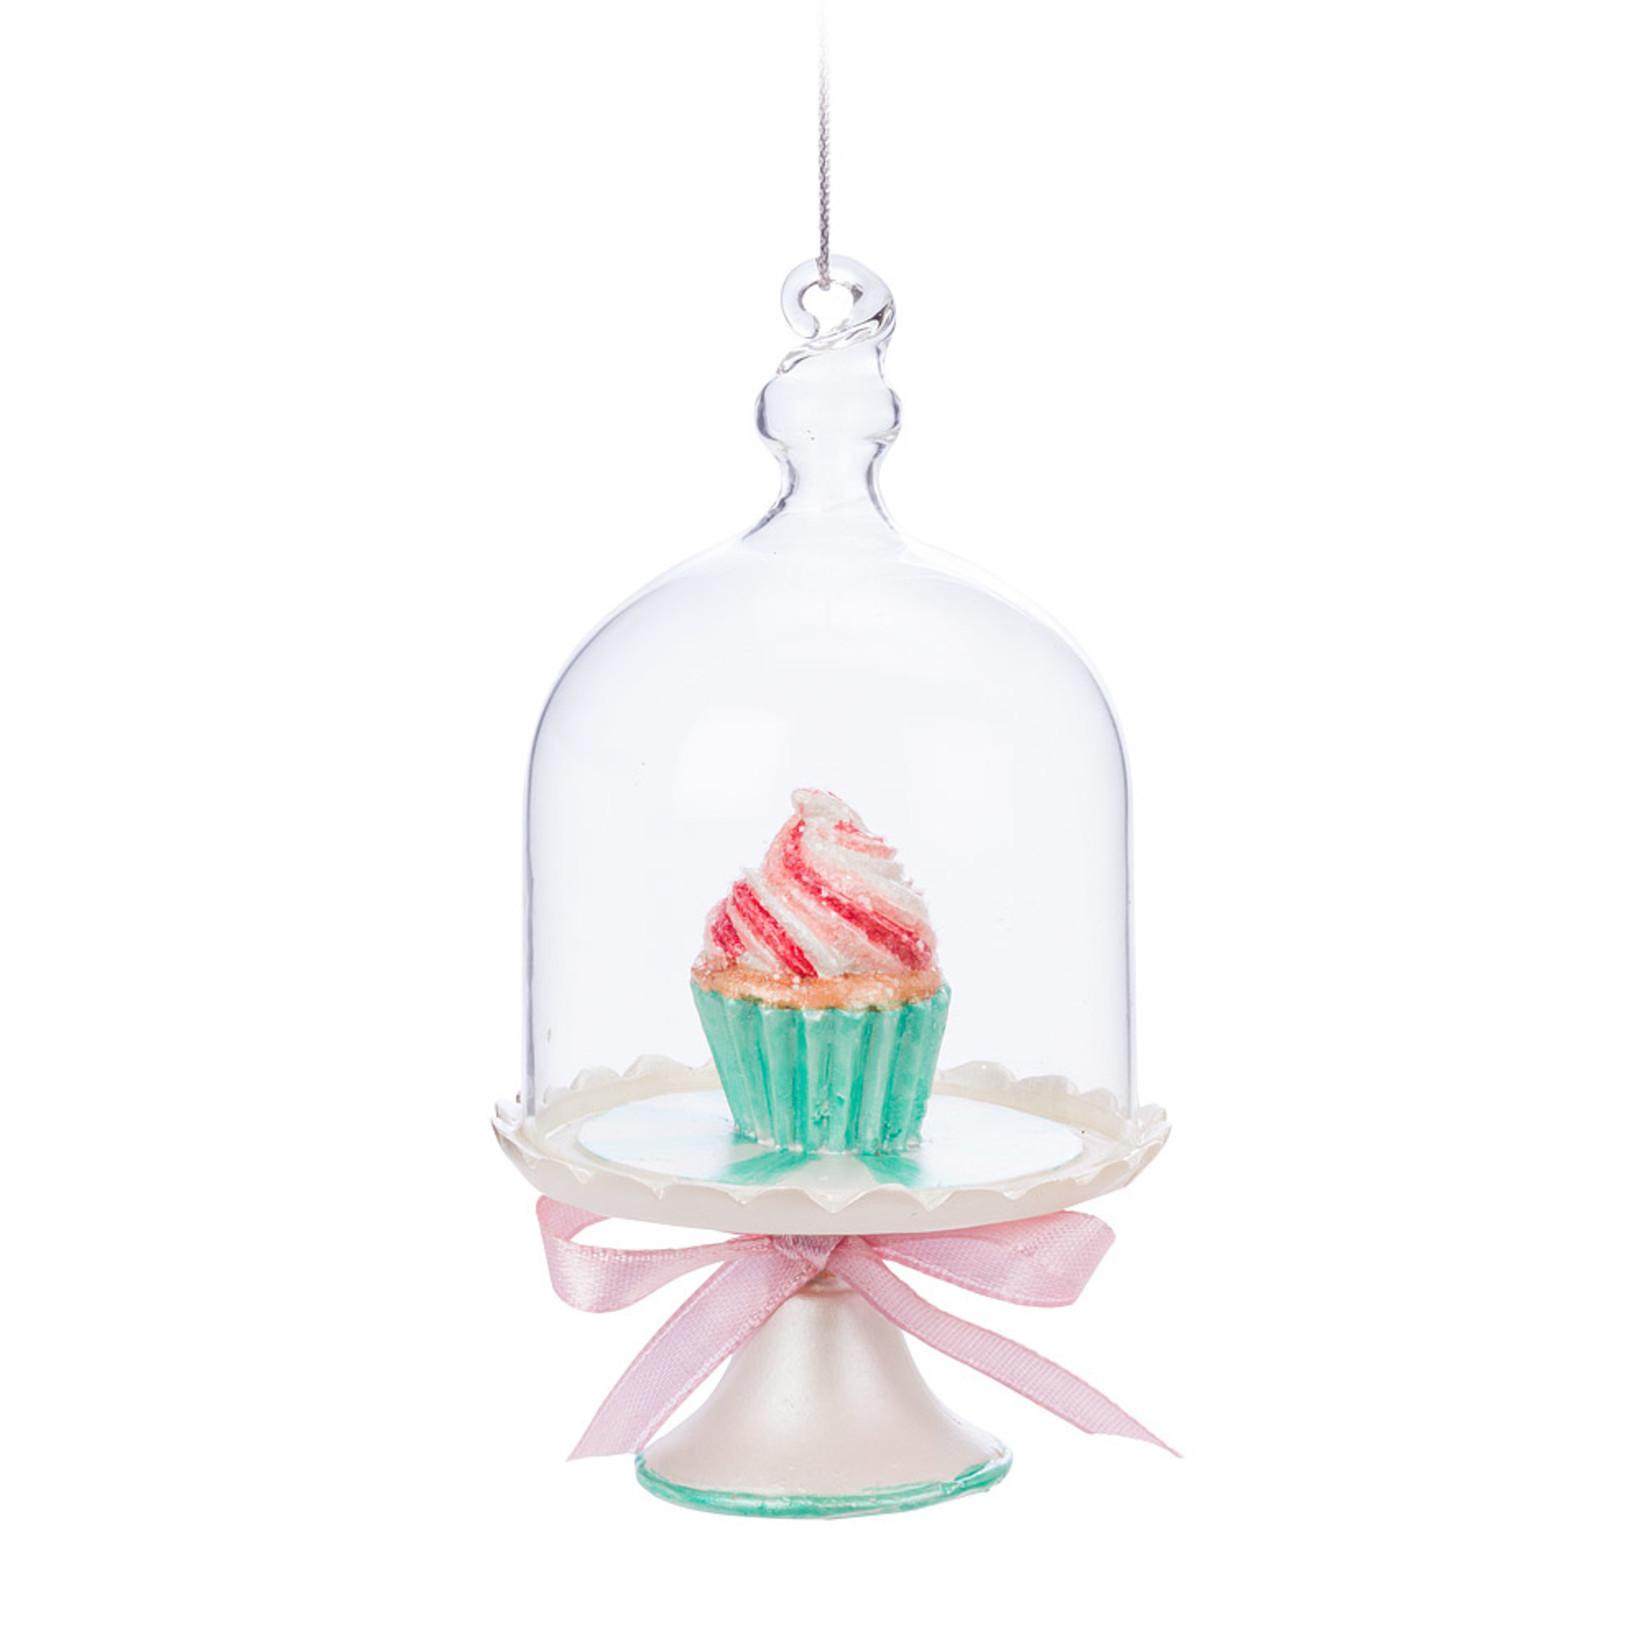 Abbott Glass Dome Cupcake Ornament